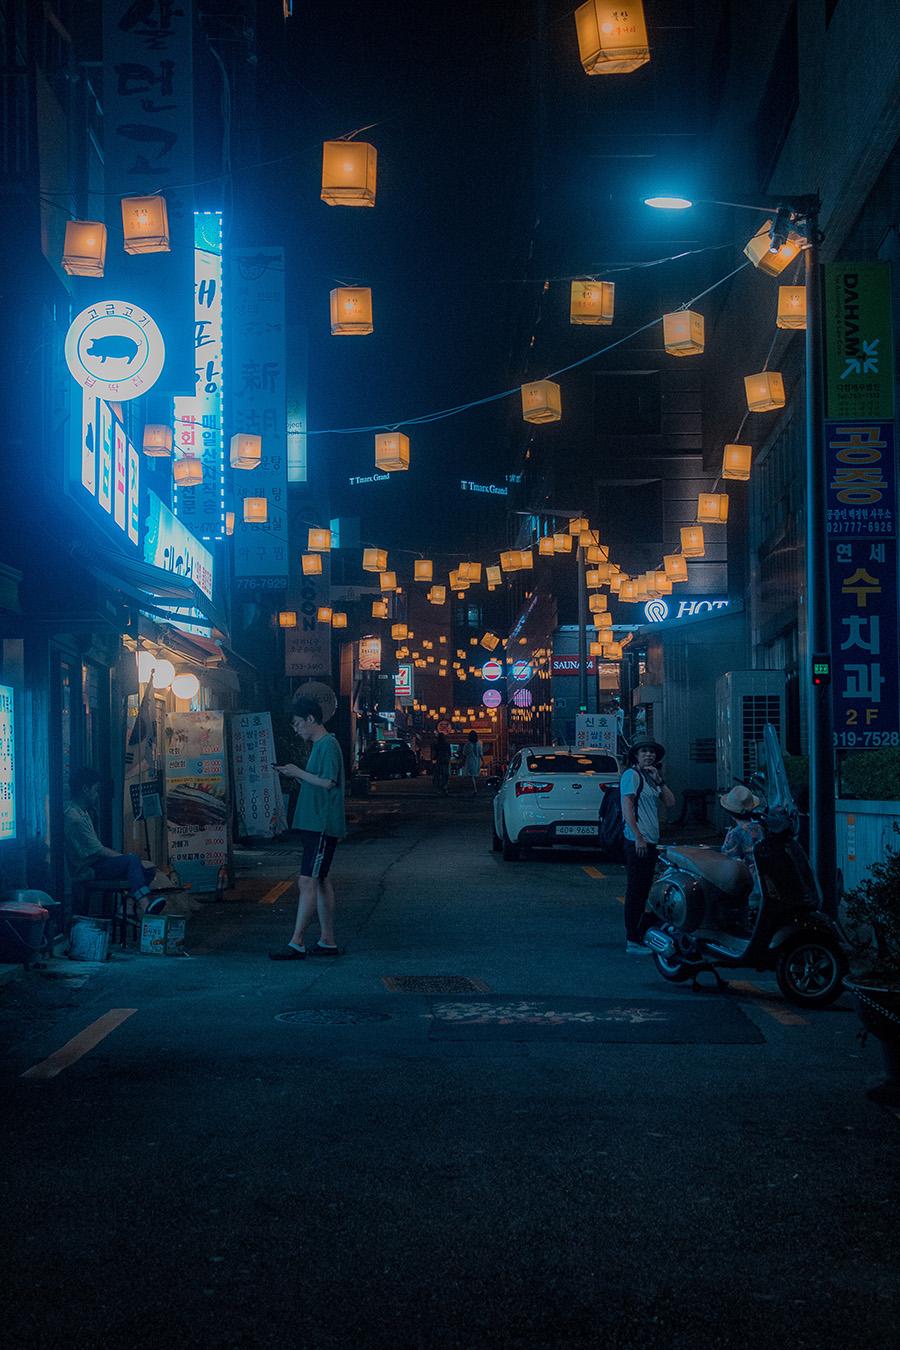 street photography 001